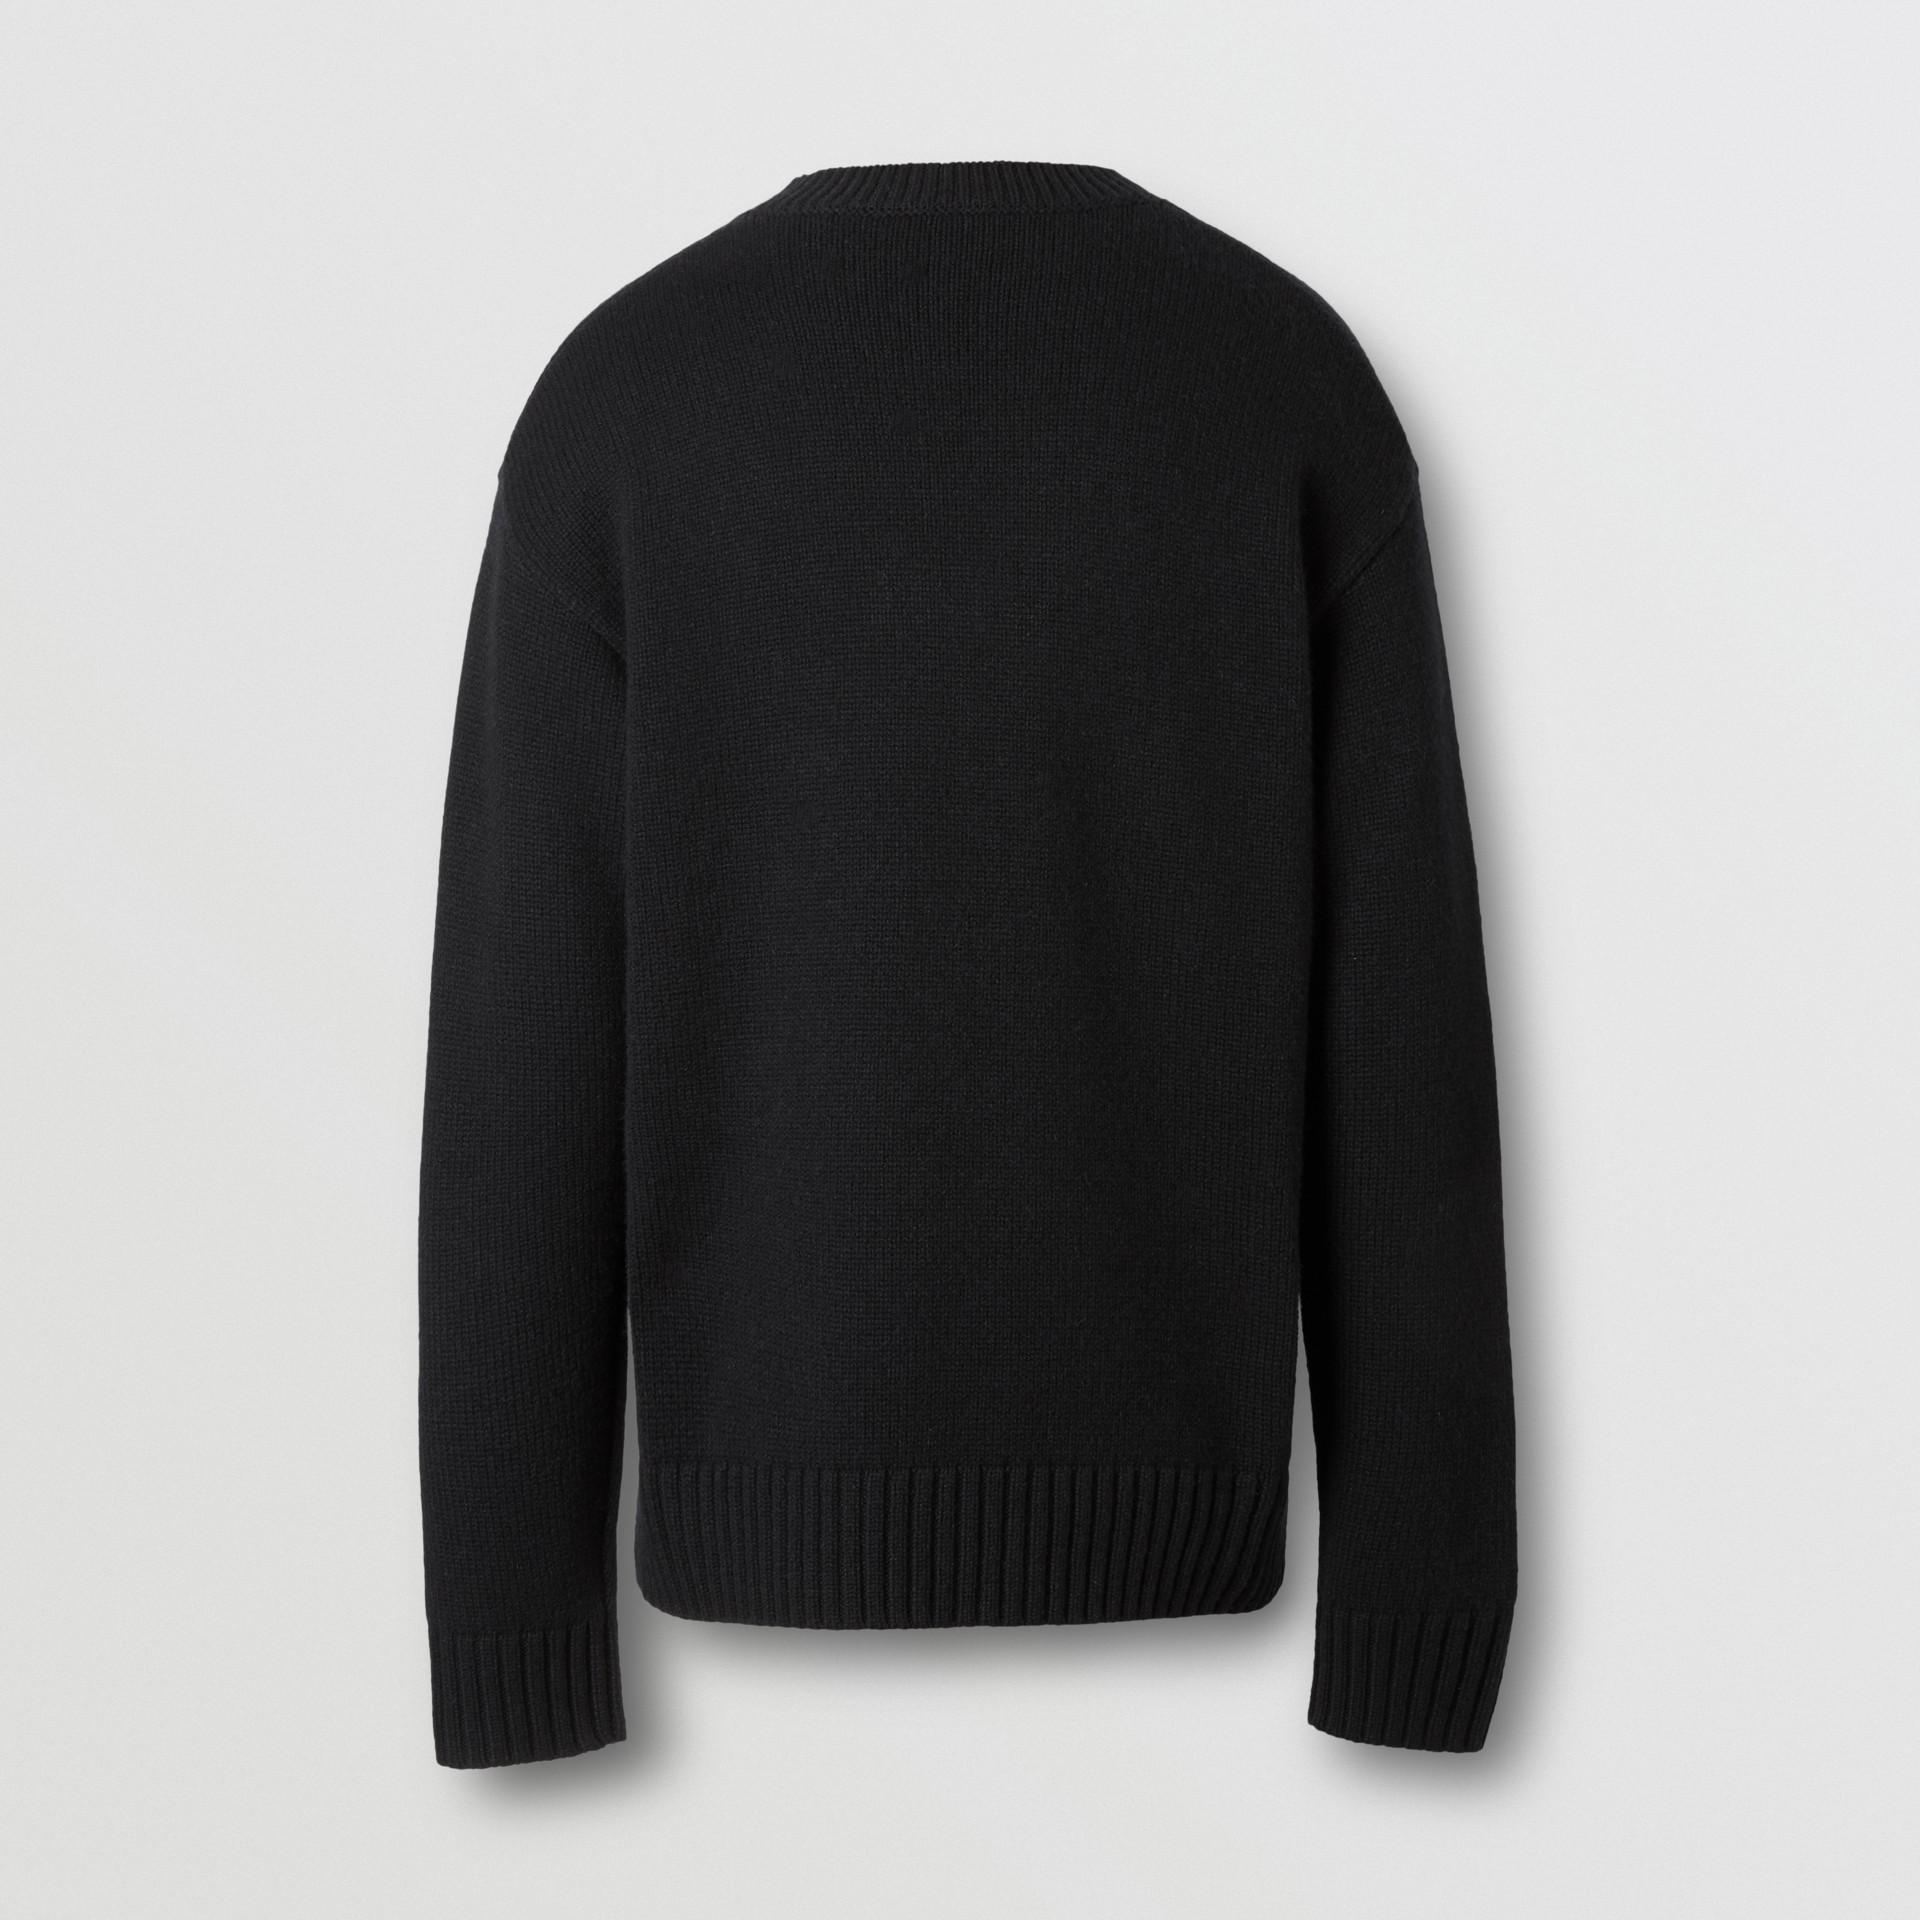 Slogan Intarsia Cashmere Sweater in Black - Men | Burberry - gallery image 5